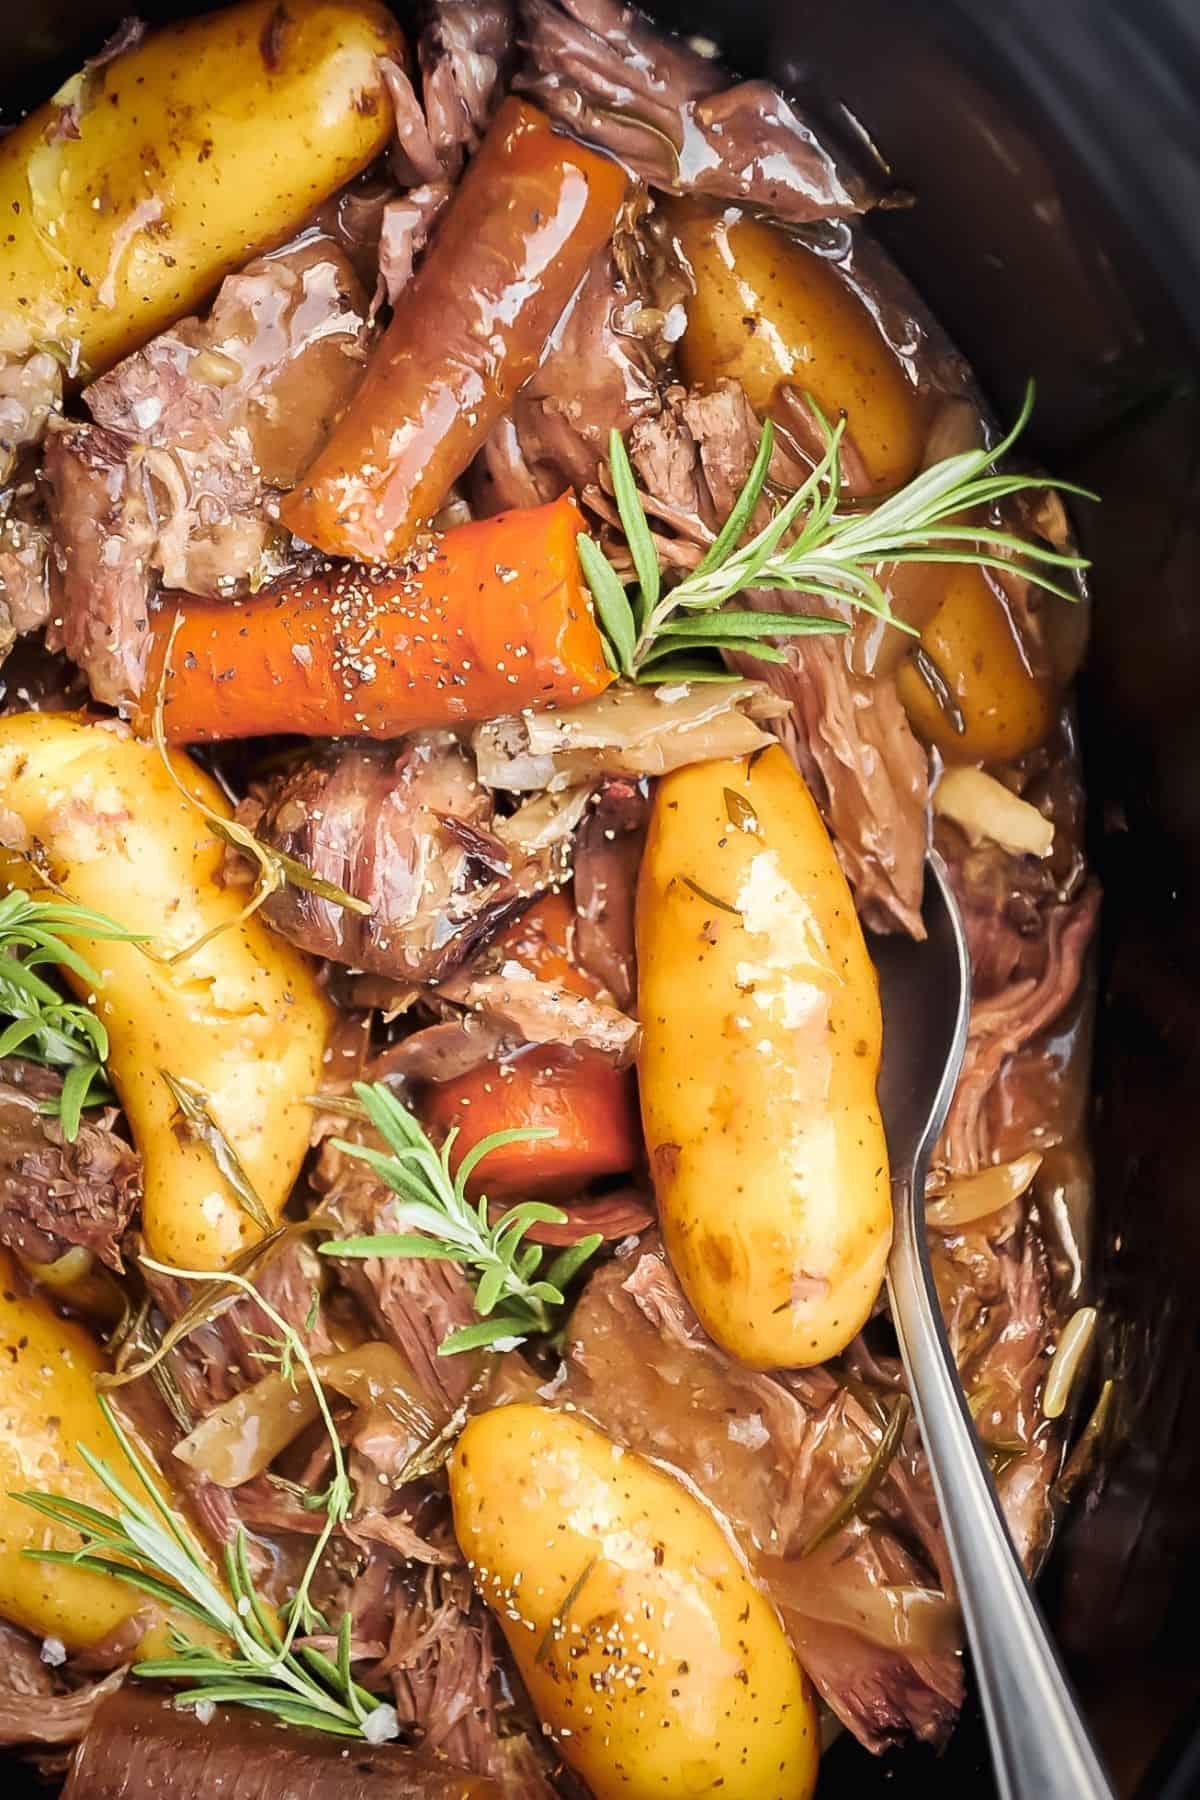 crock-pot-roast-with-carrots-potatoes